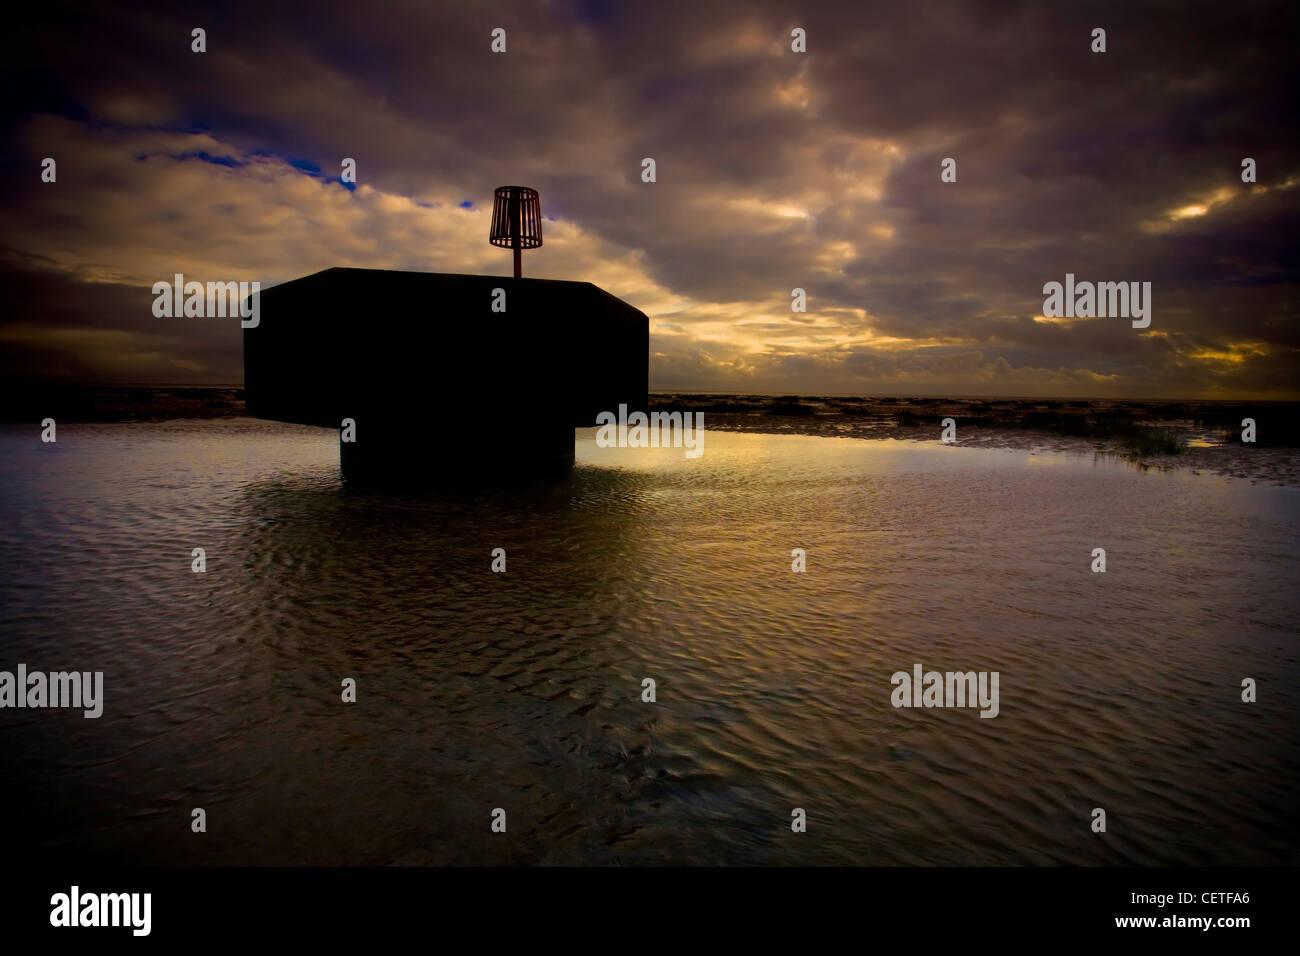 Dark skies over a tide groyne at high tide in Fleetwood. - Stock Image